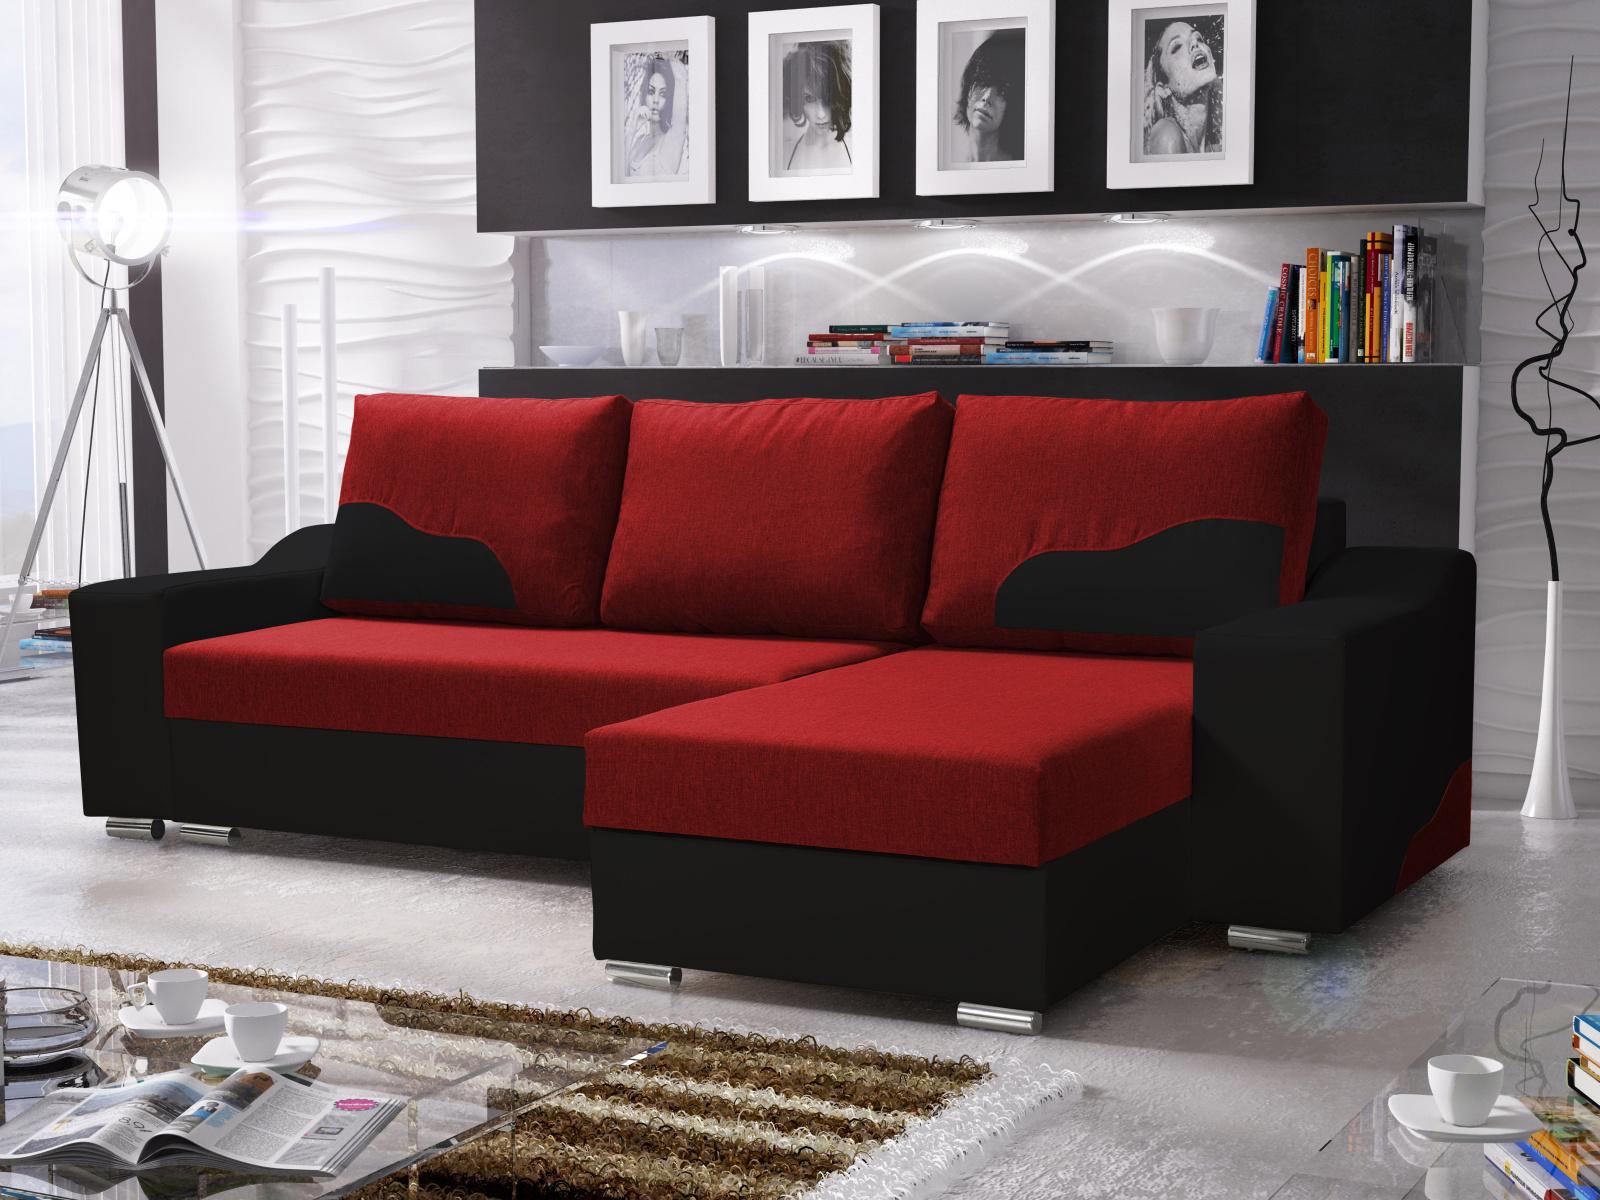 Smartshop Rohová sedačka WILLIAM 270/1, červená/černá